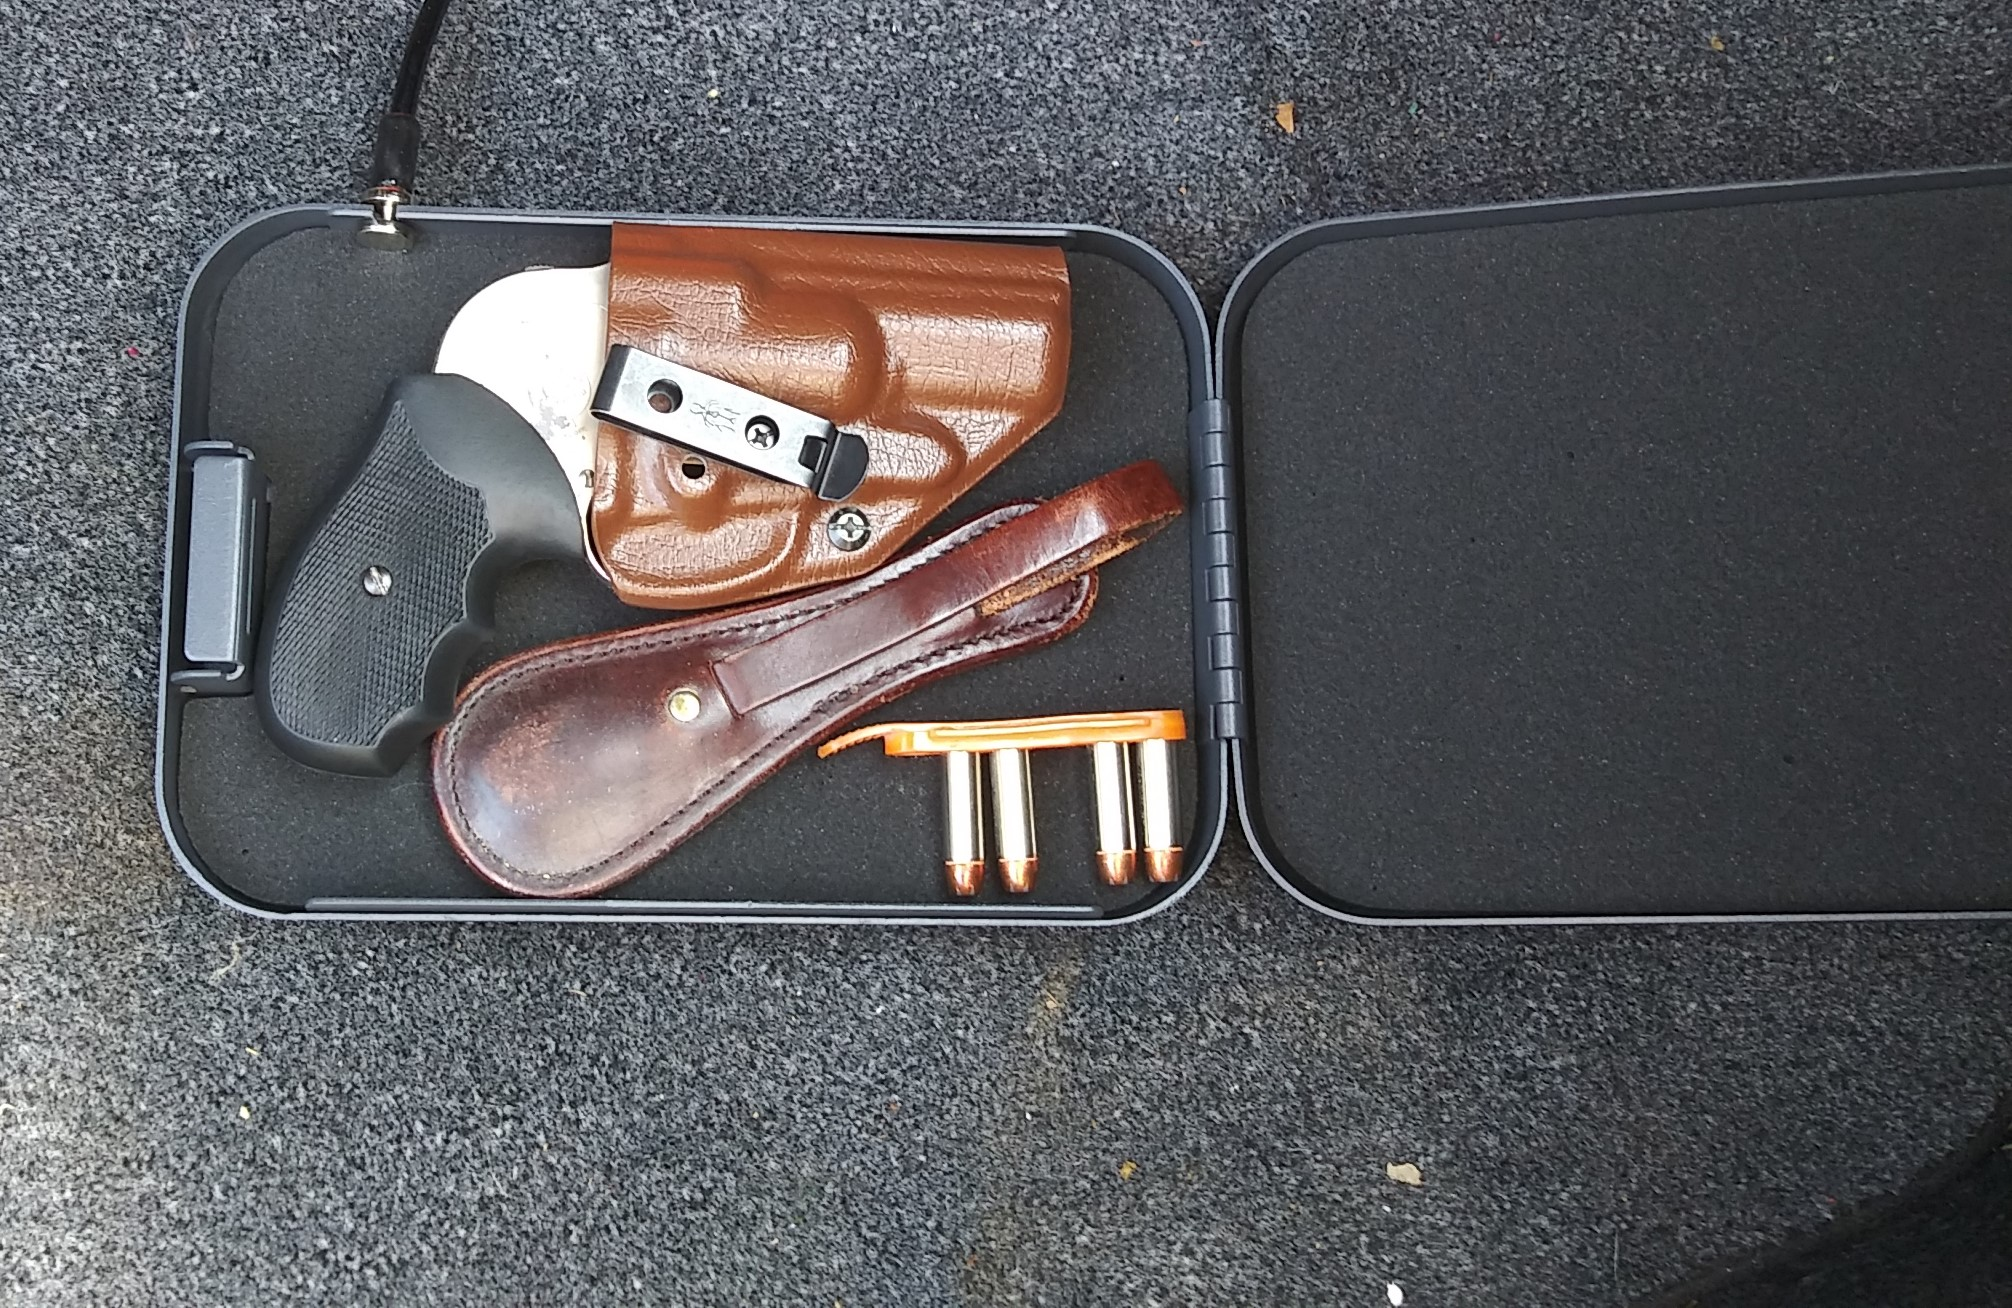 gun in safe